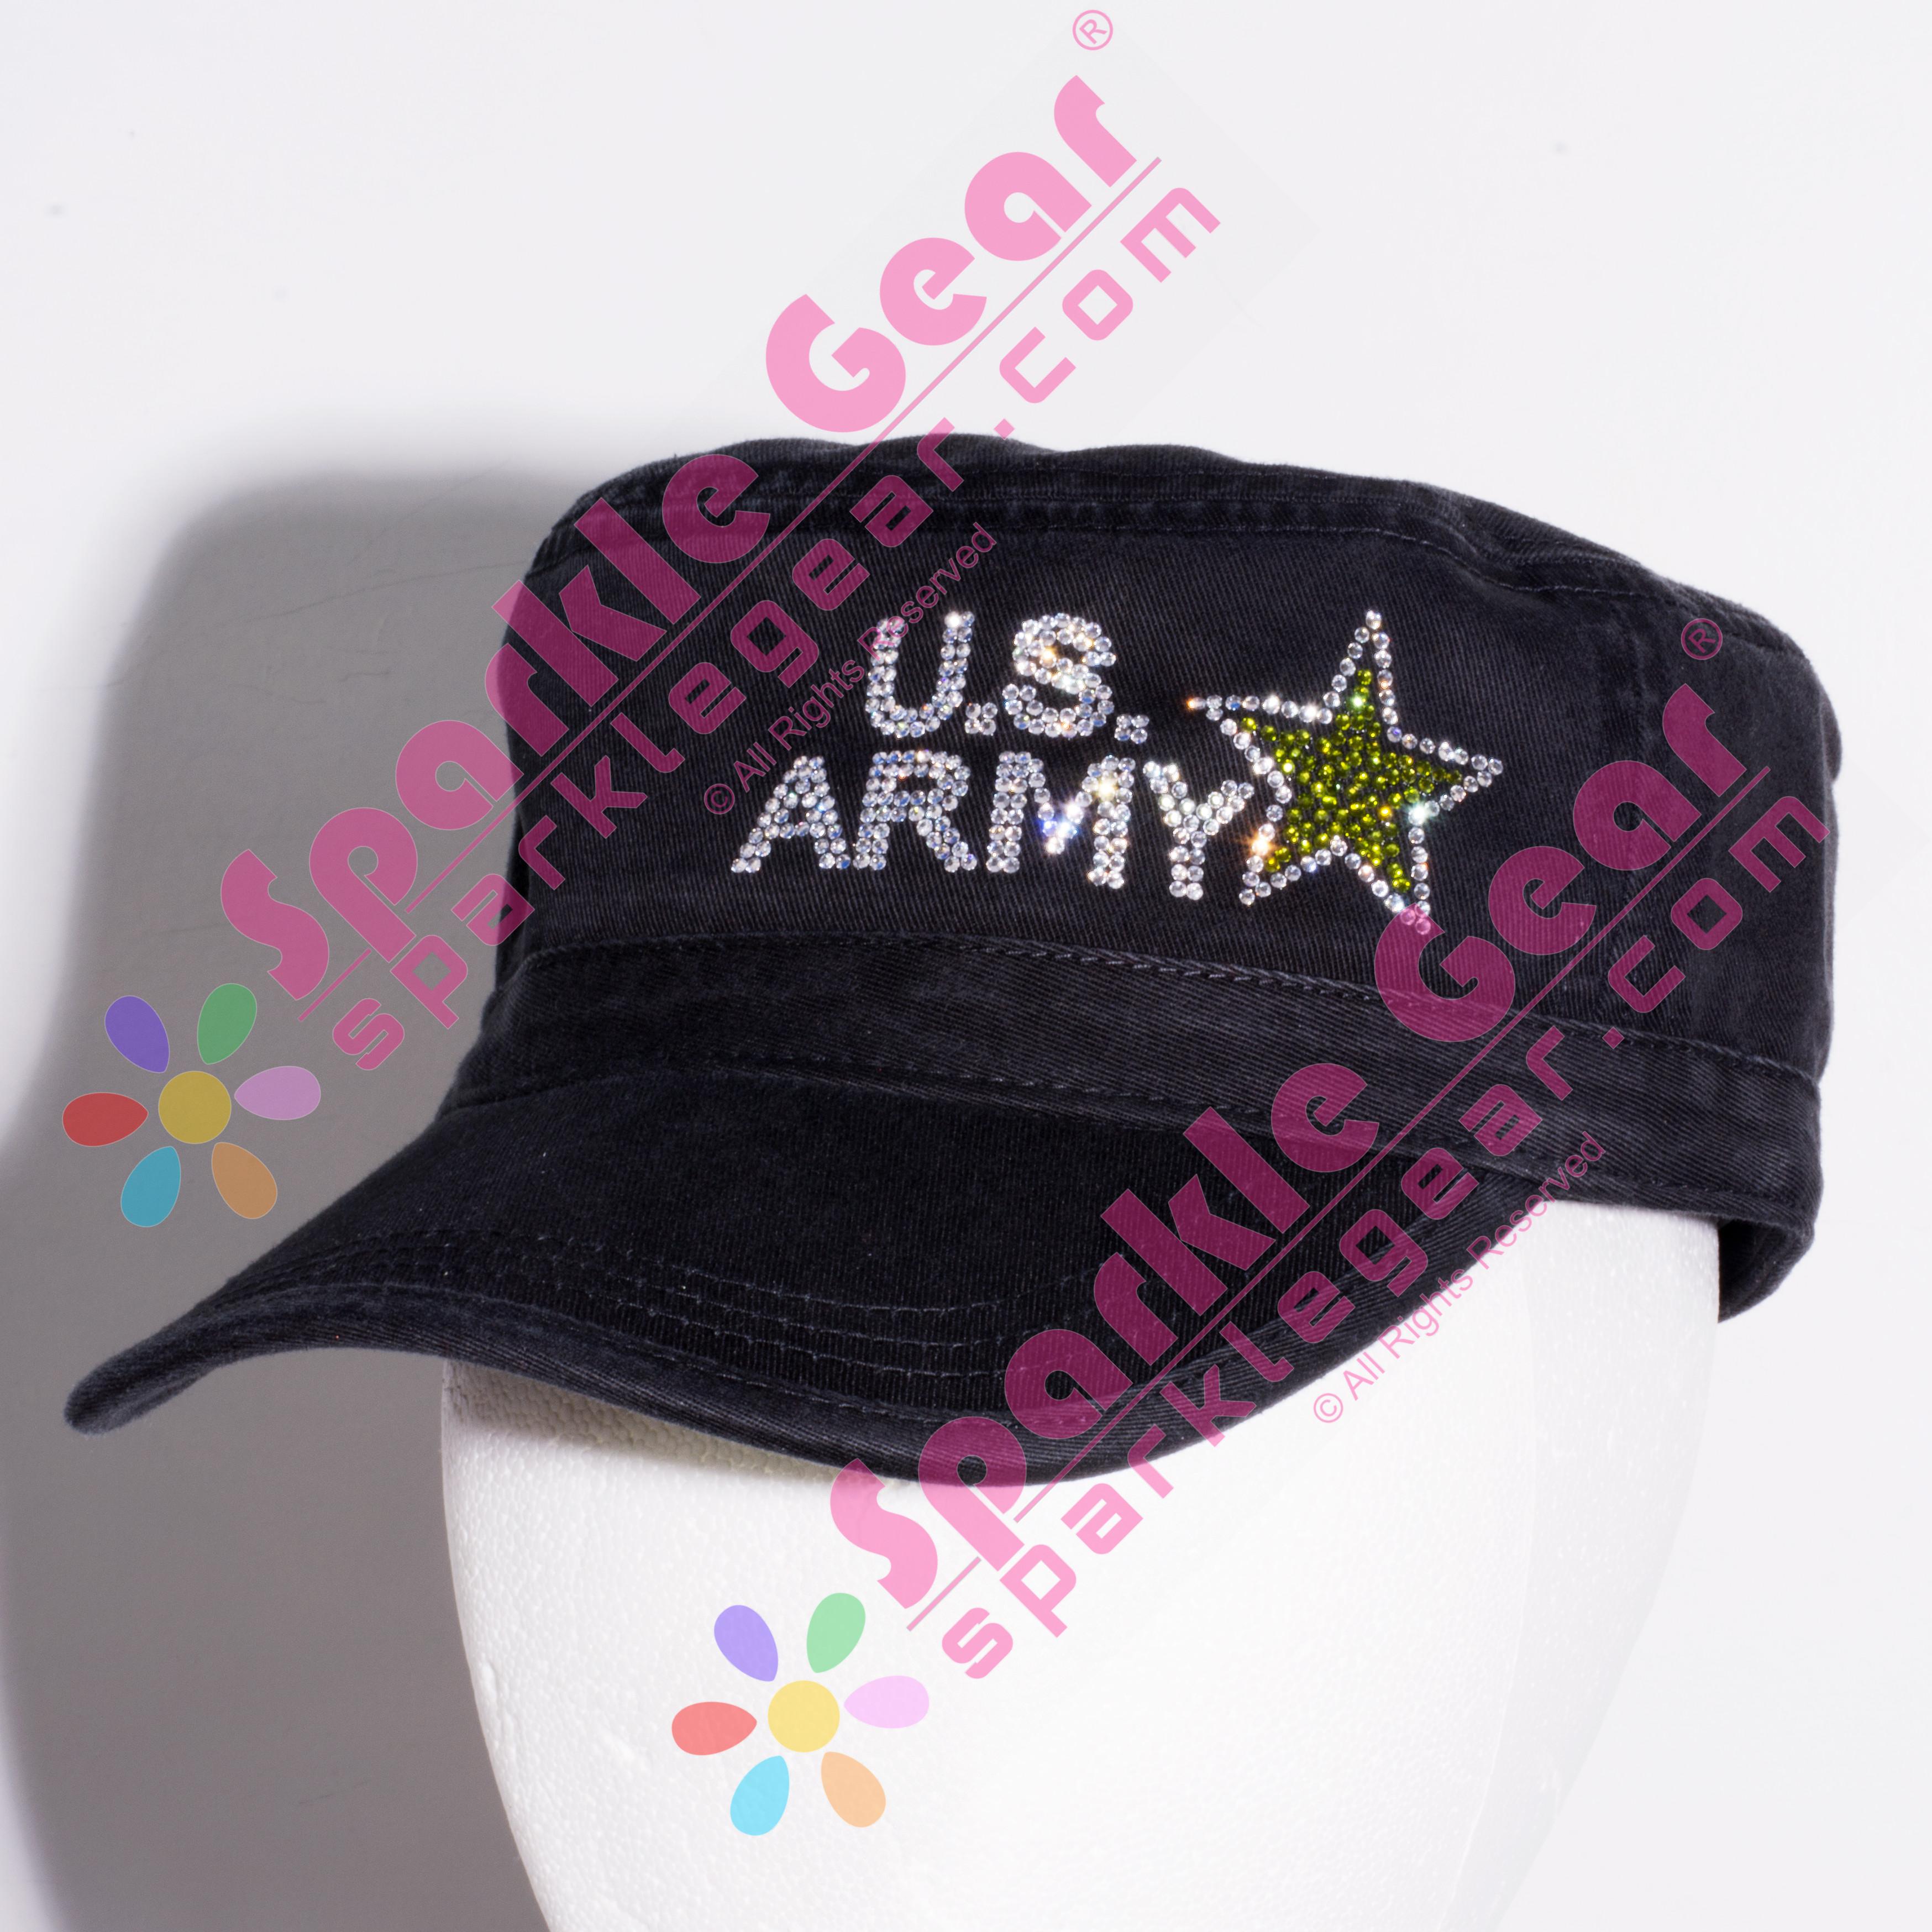 Army Mom Cadet Hat - Sparkle Gear